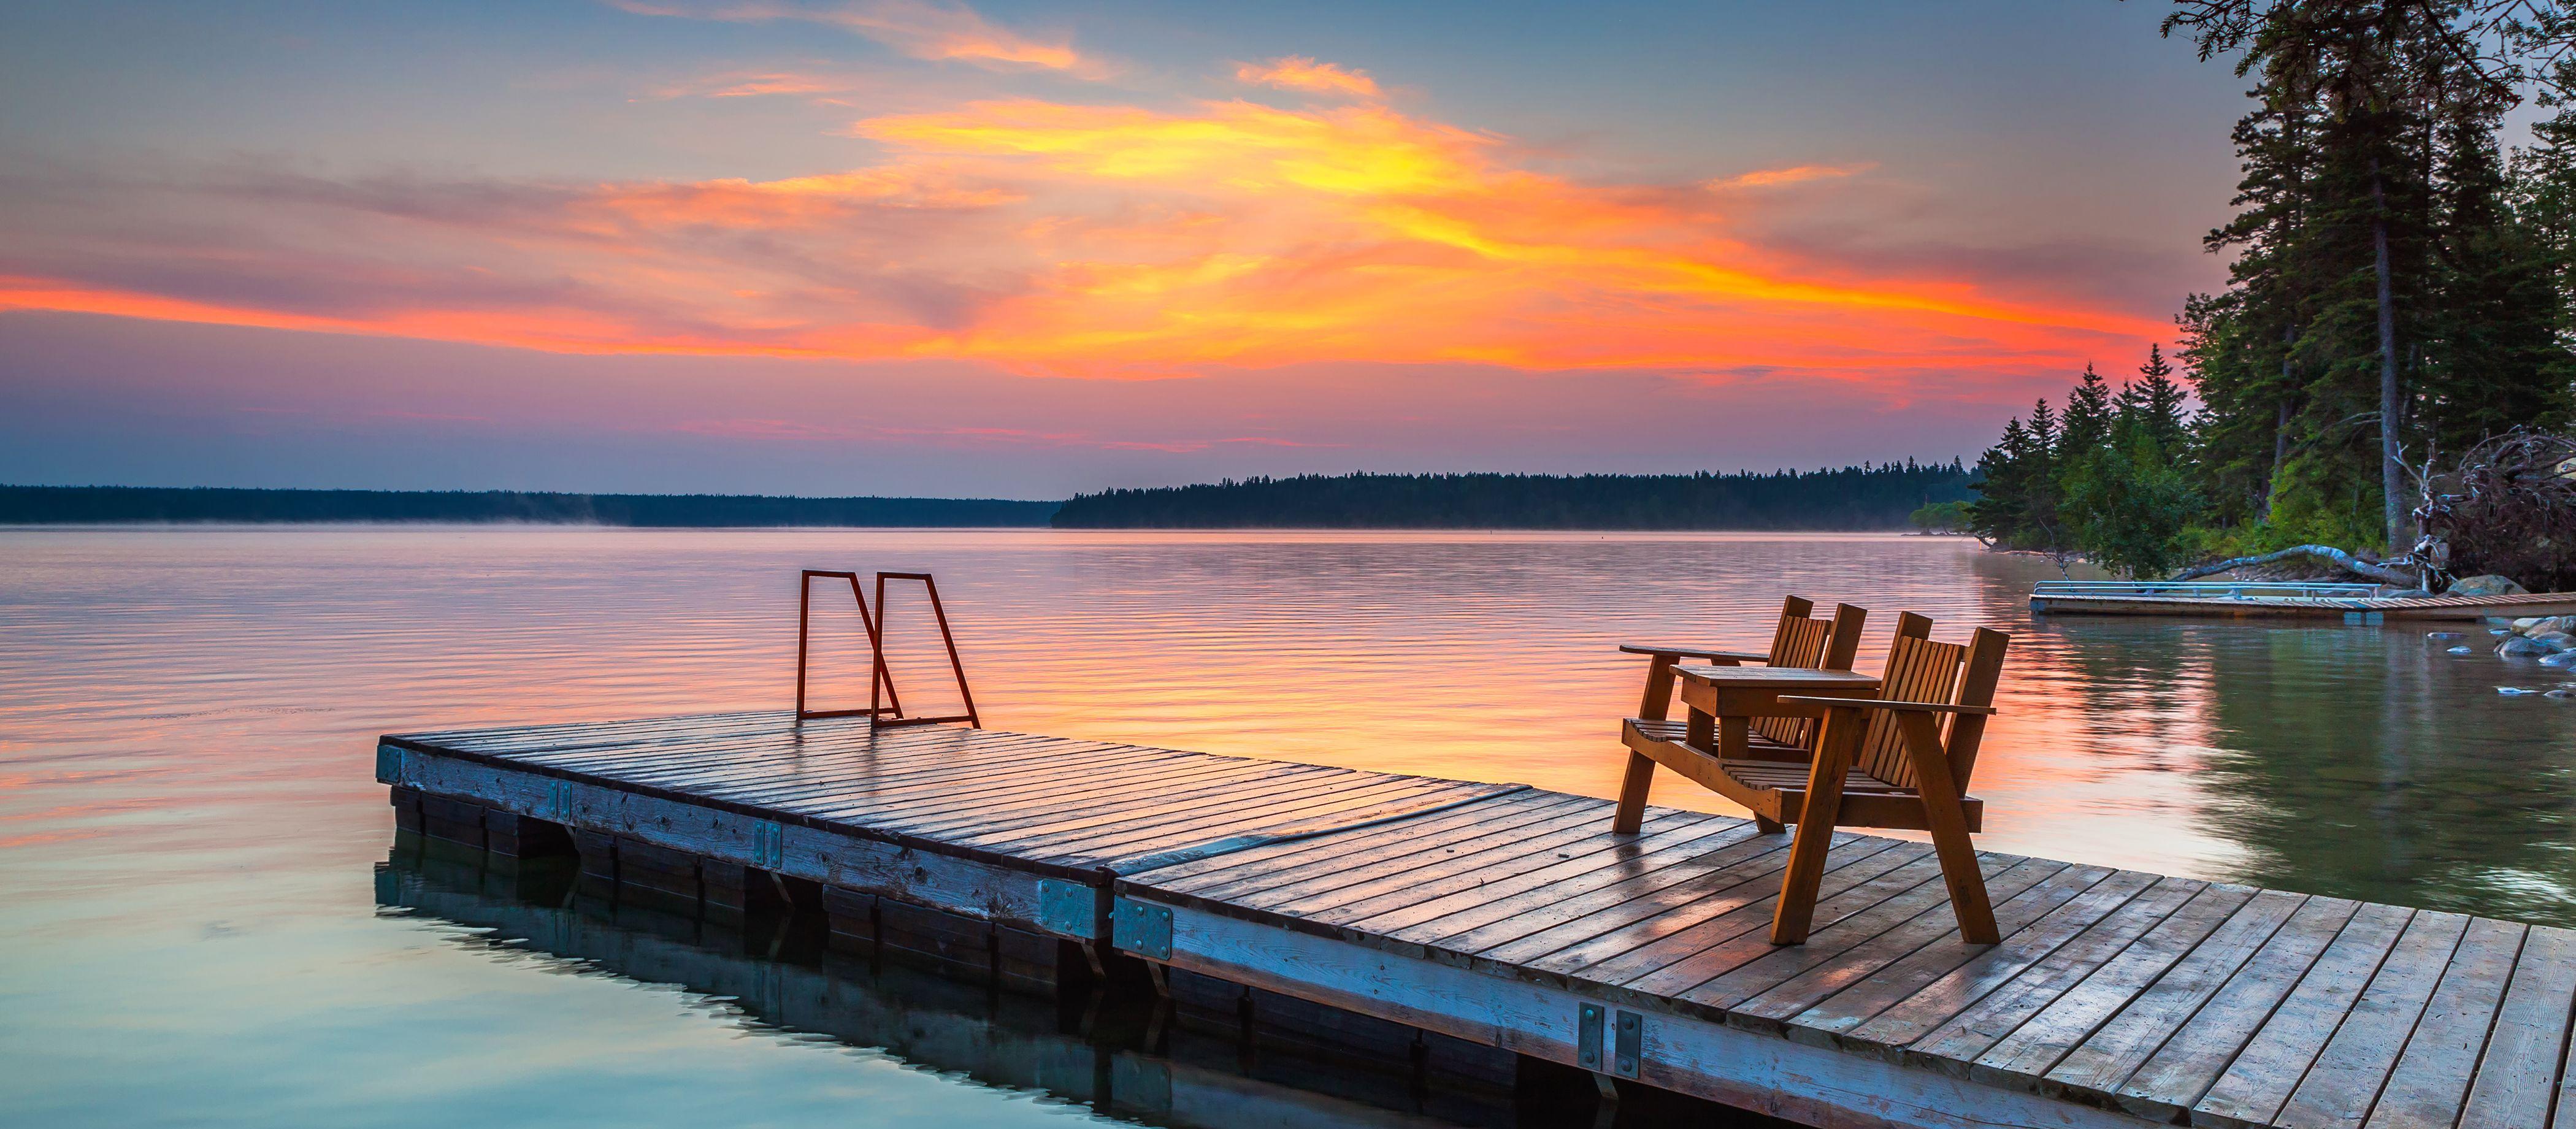 Den Sonnenaufgang bewundern am Clear Lake im Riding Mountain National Park in Manitoba